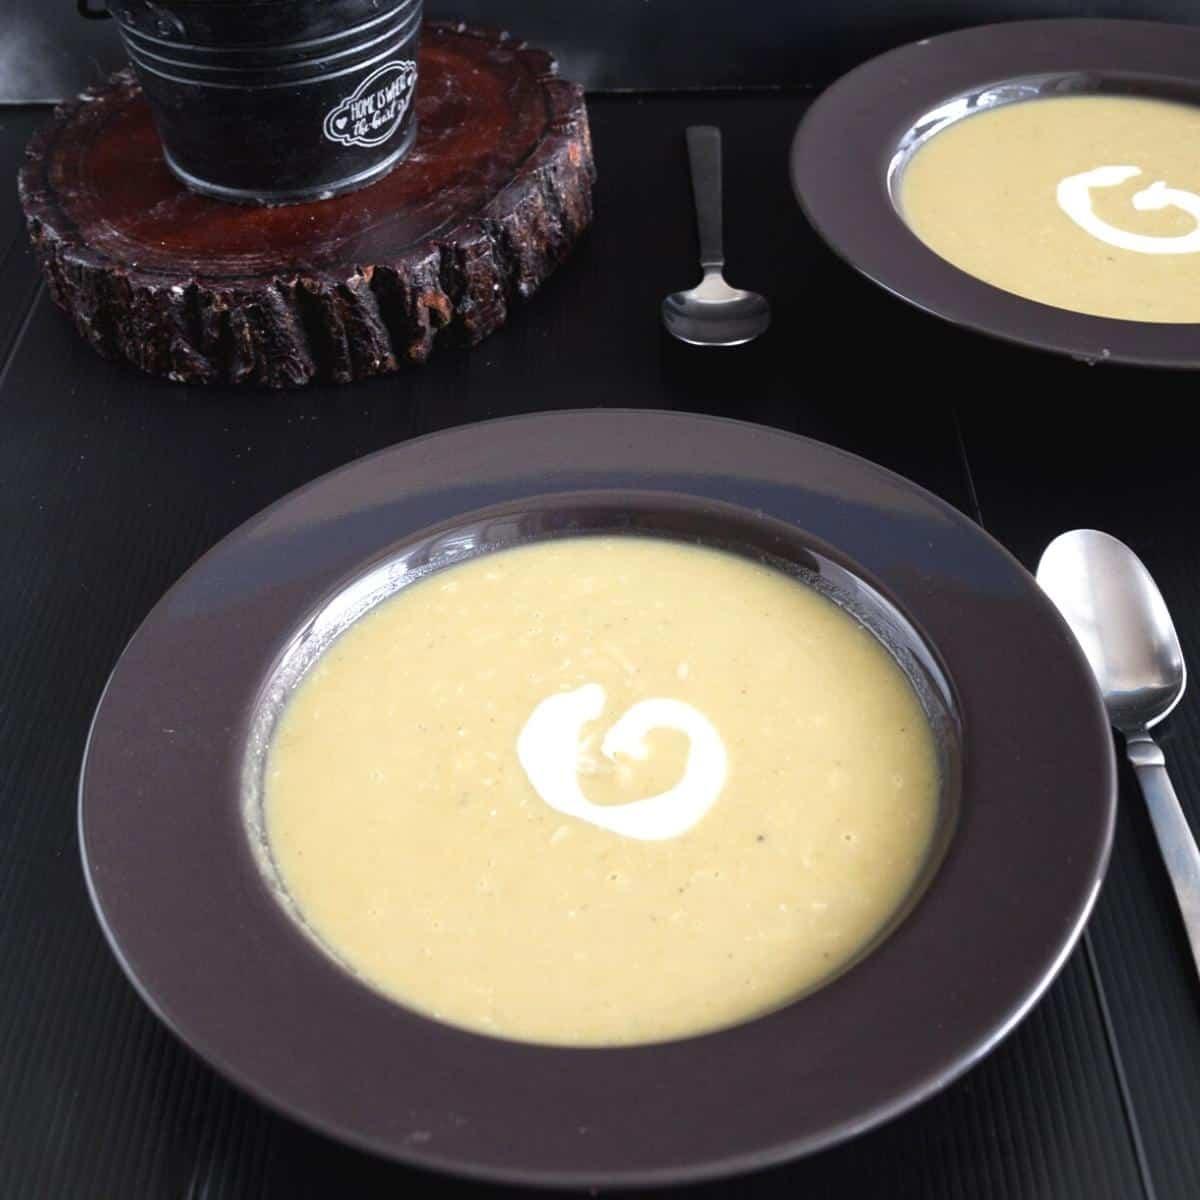 Two black soup bowls with split pea soup